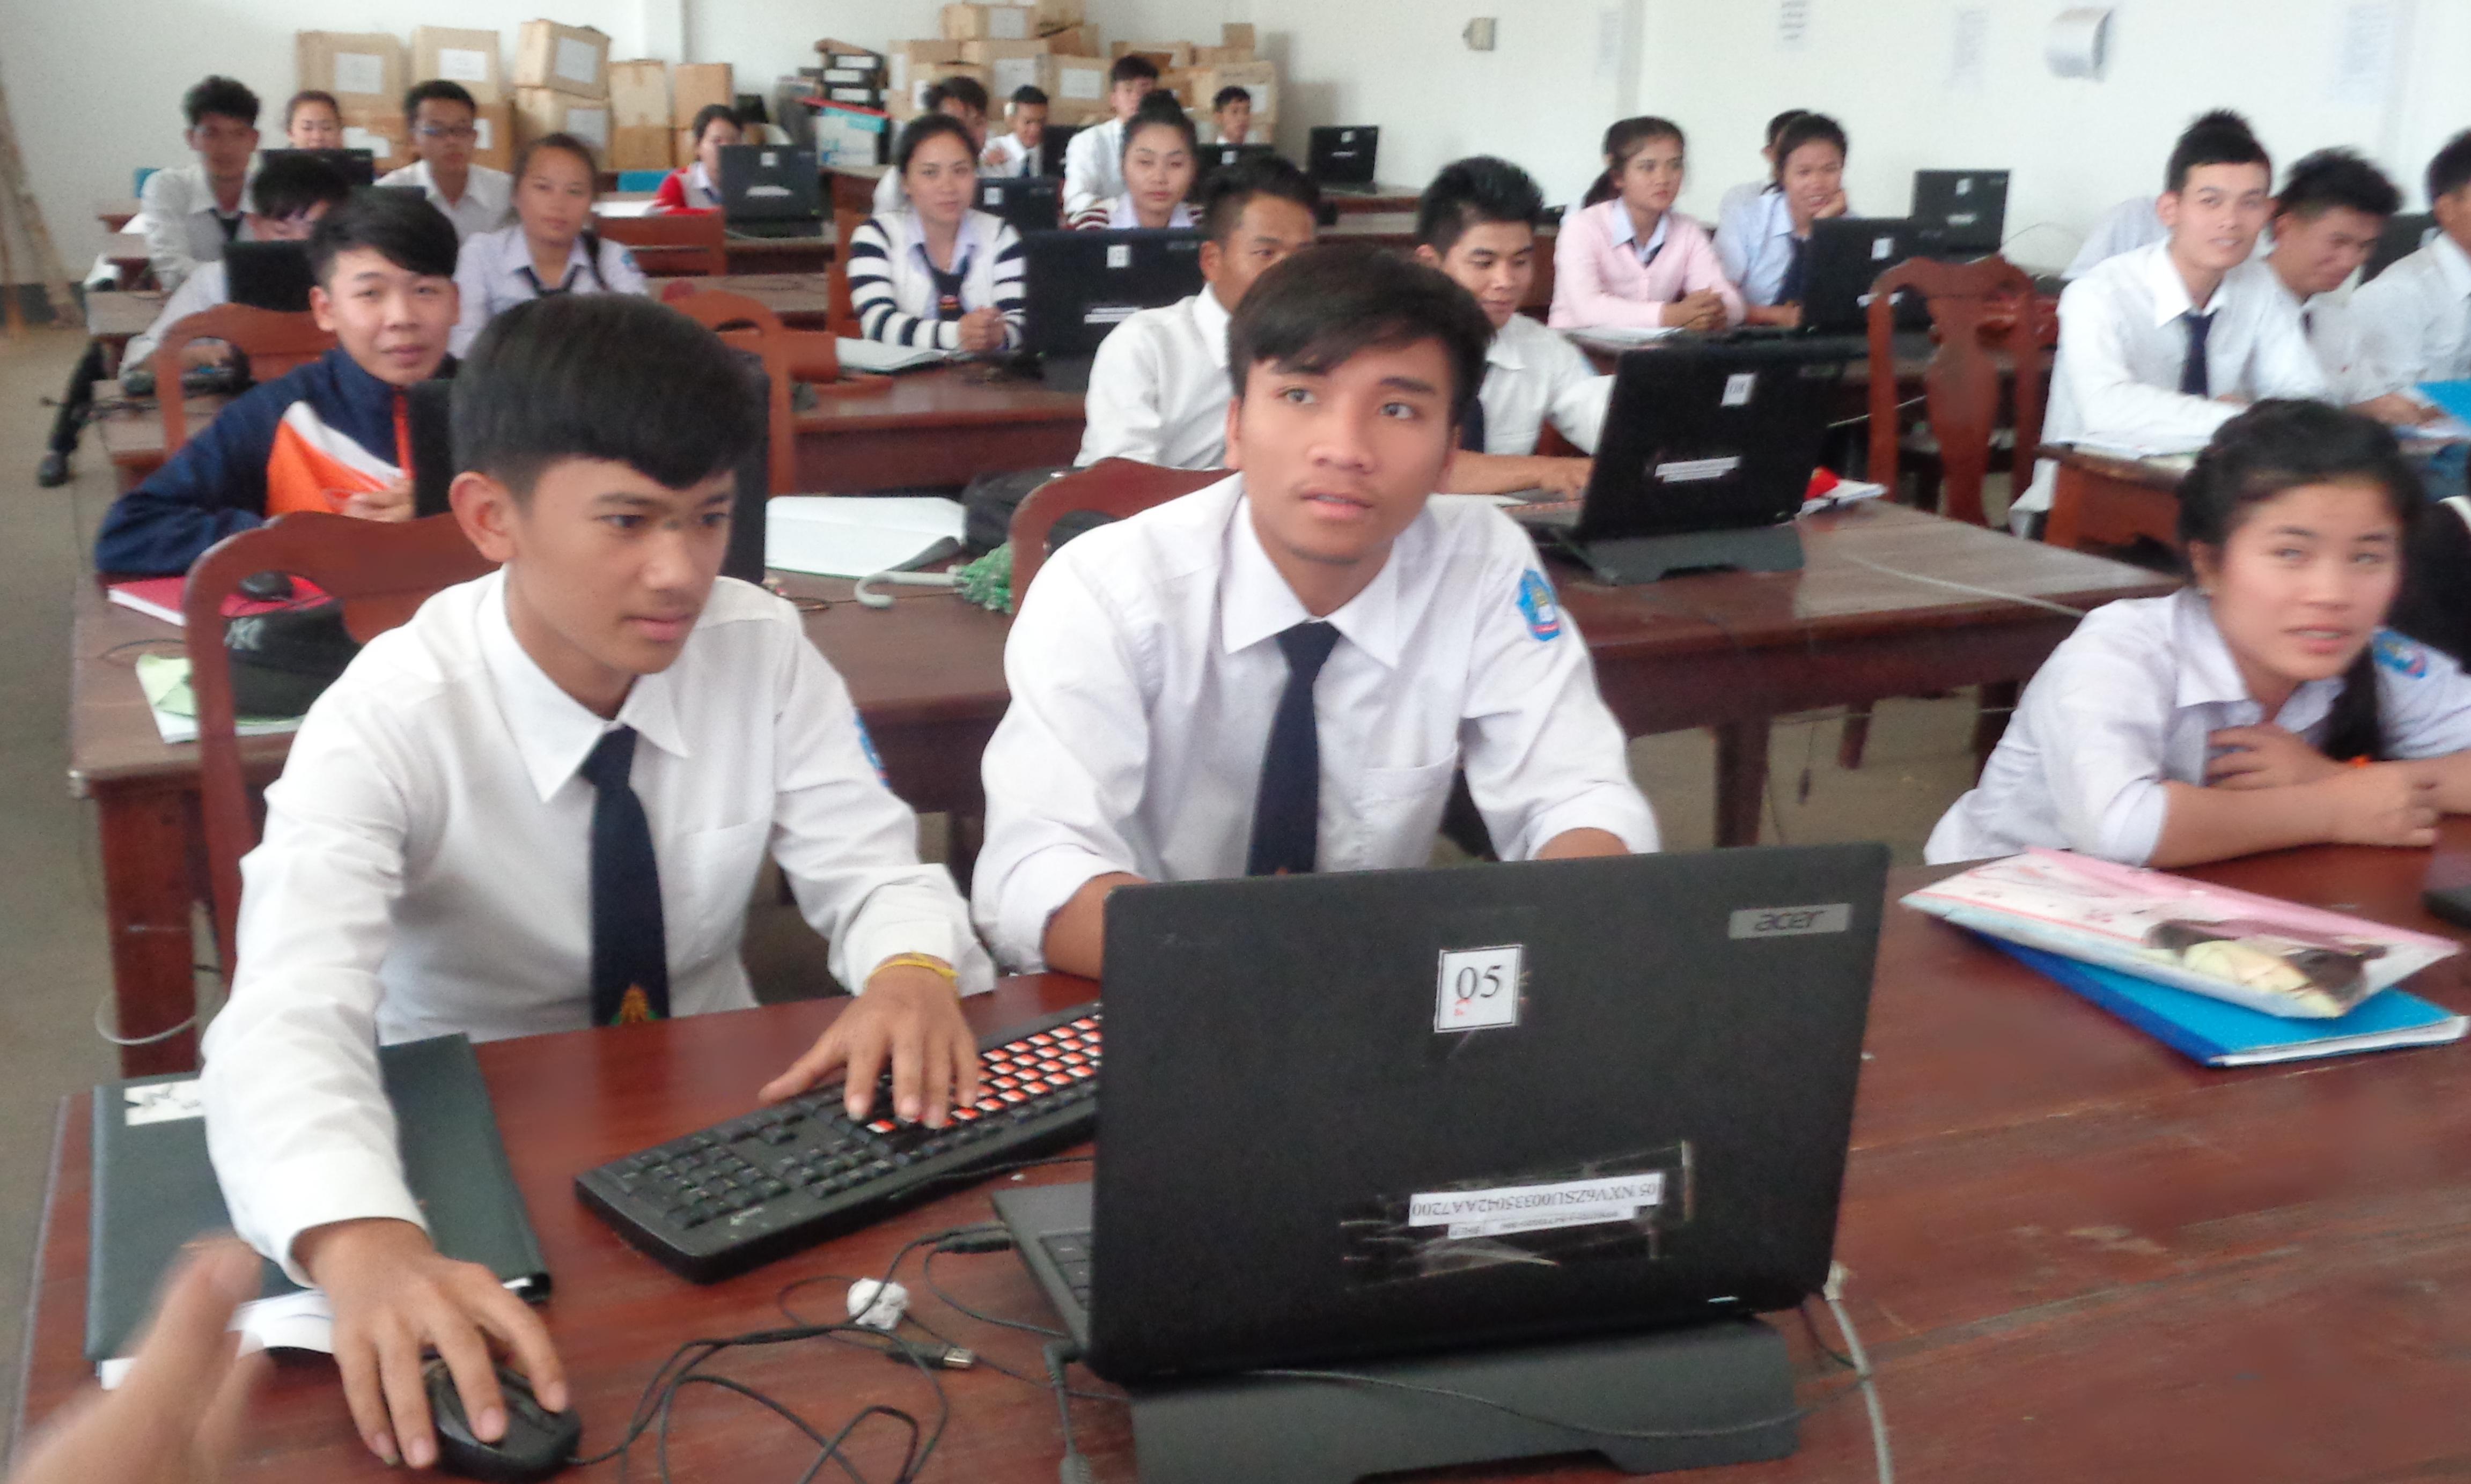 University project help